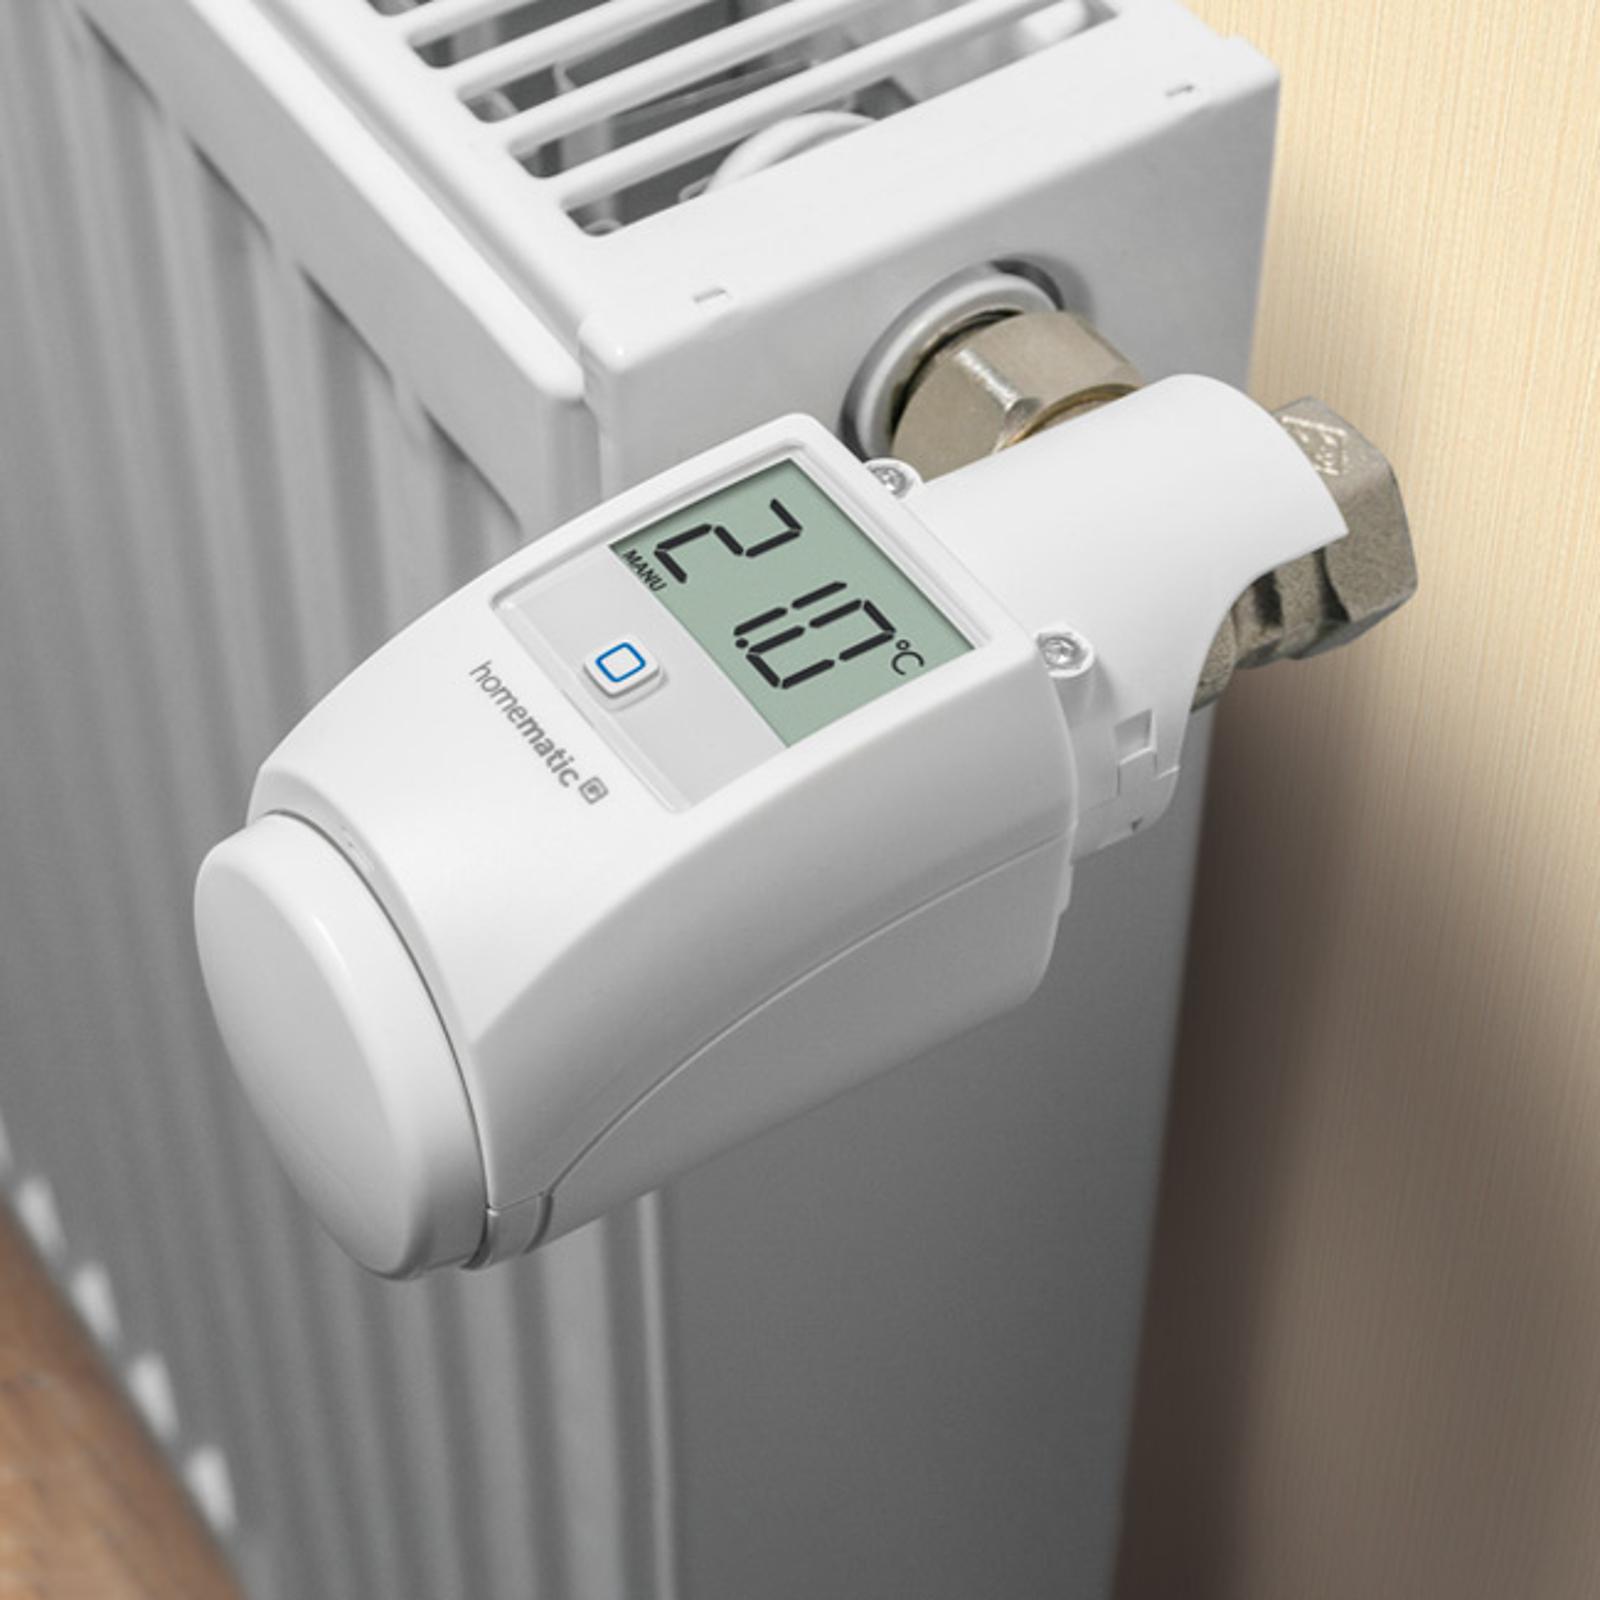 Homematic IP diefstalbescherming thermostaat